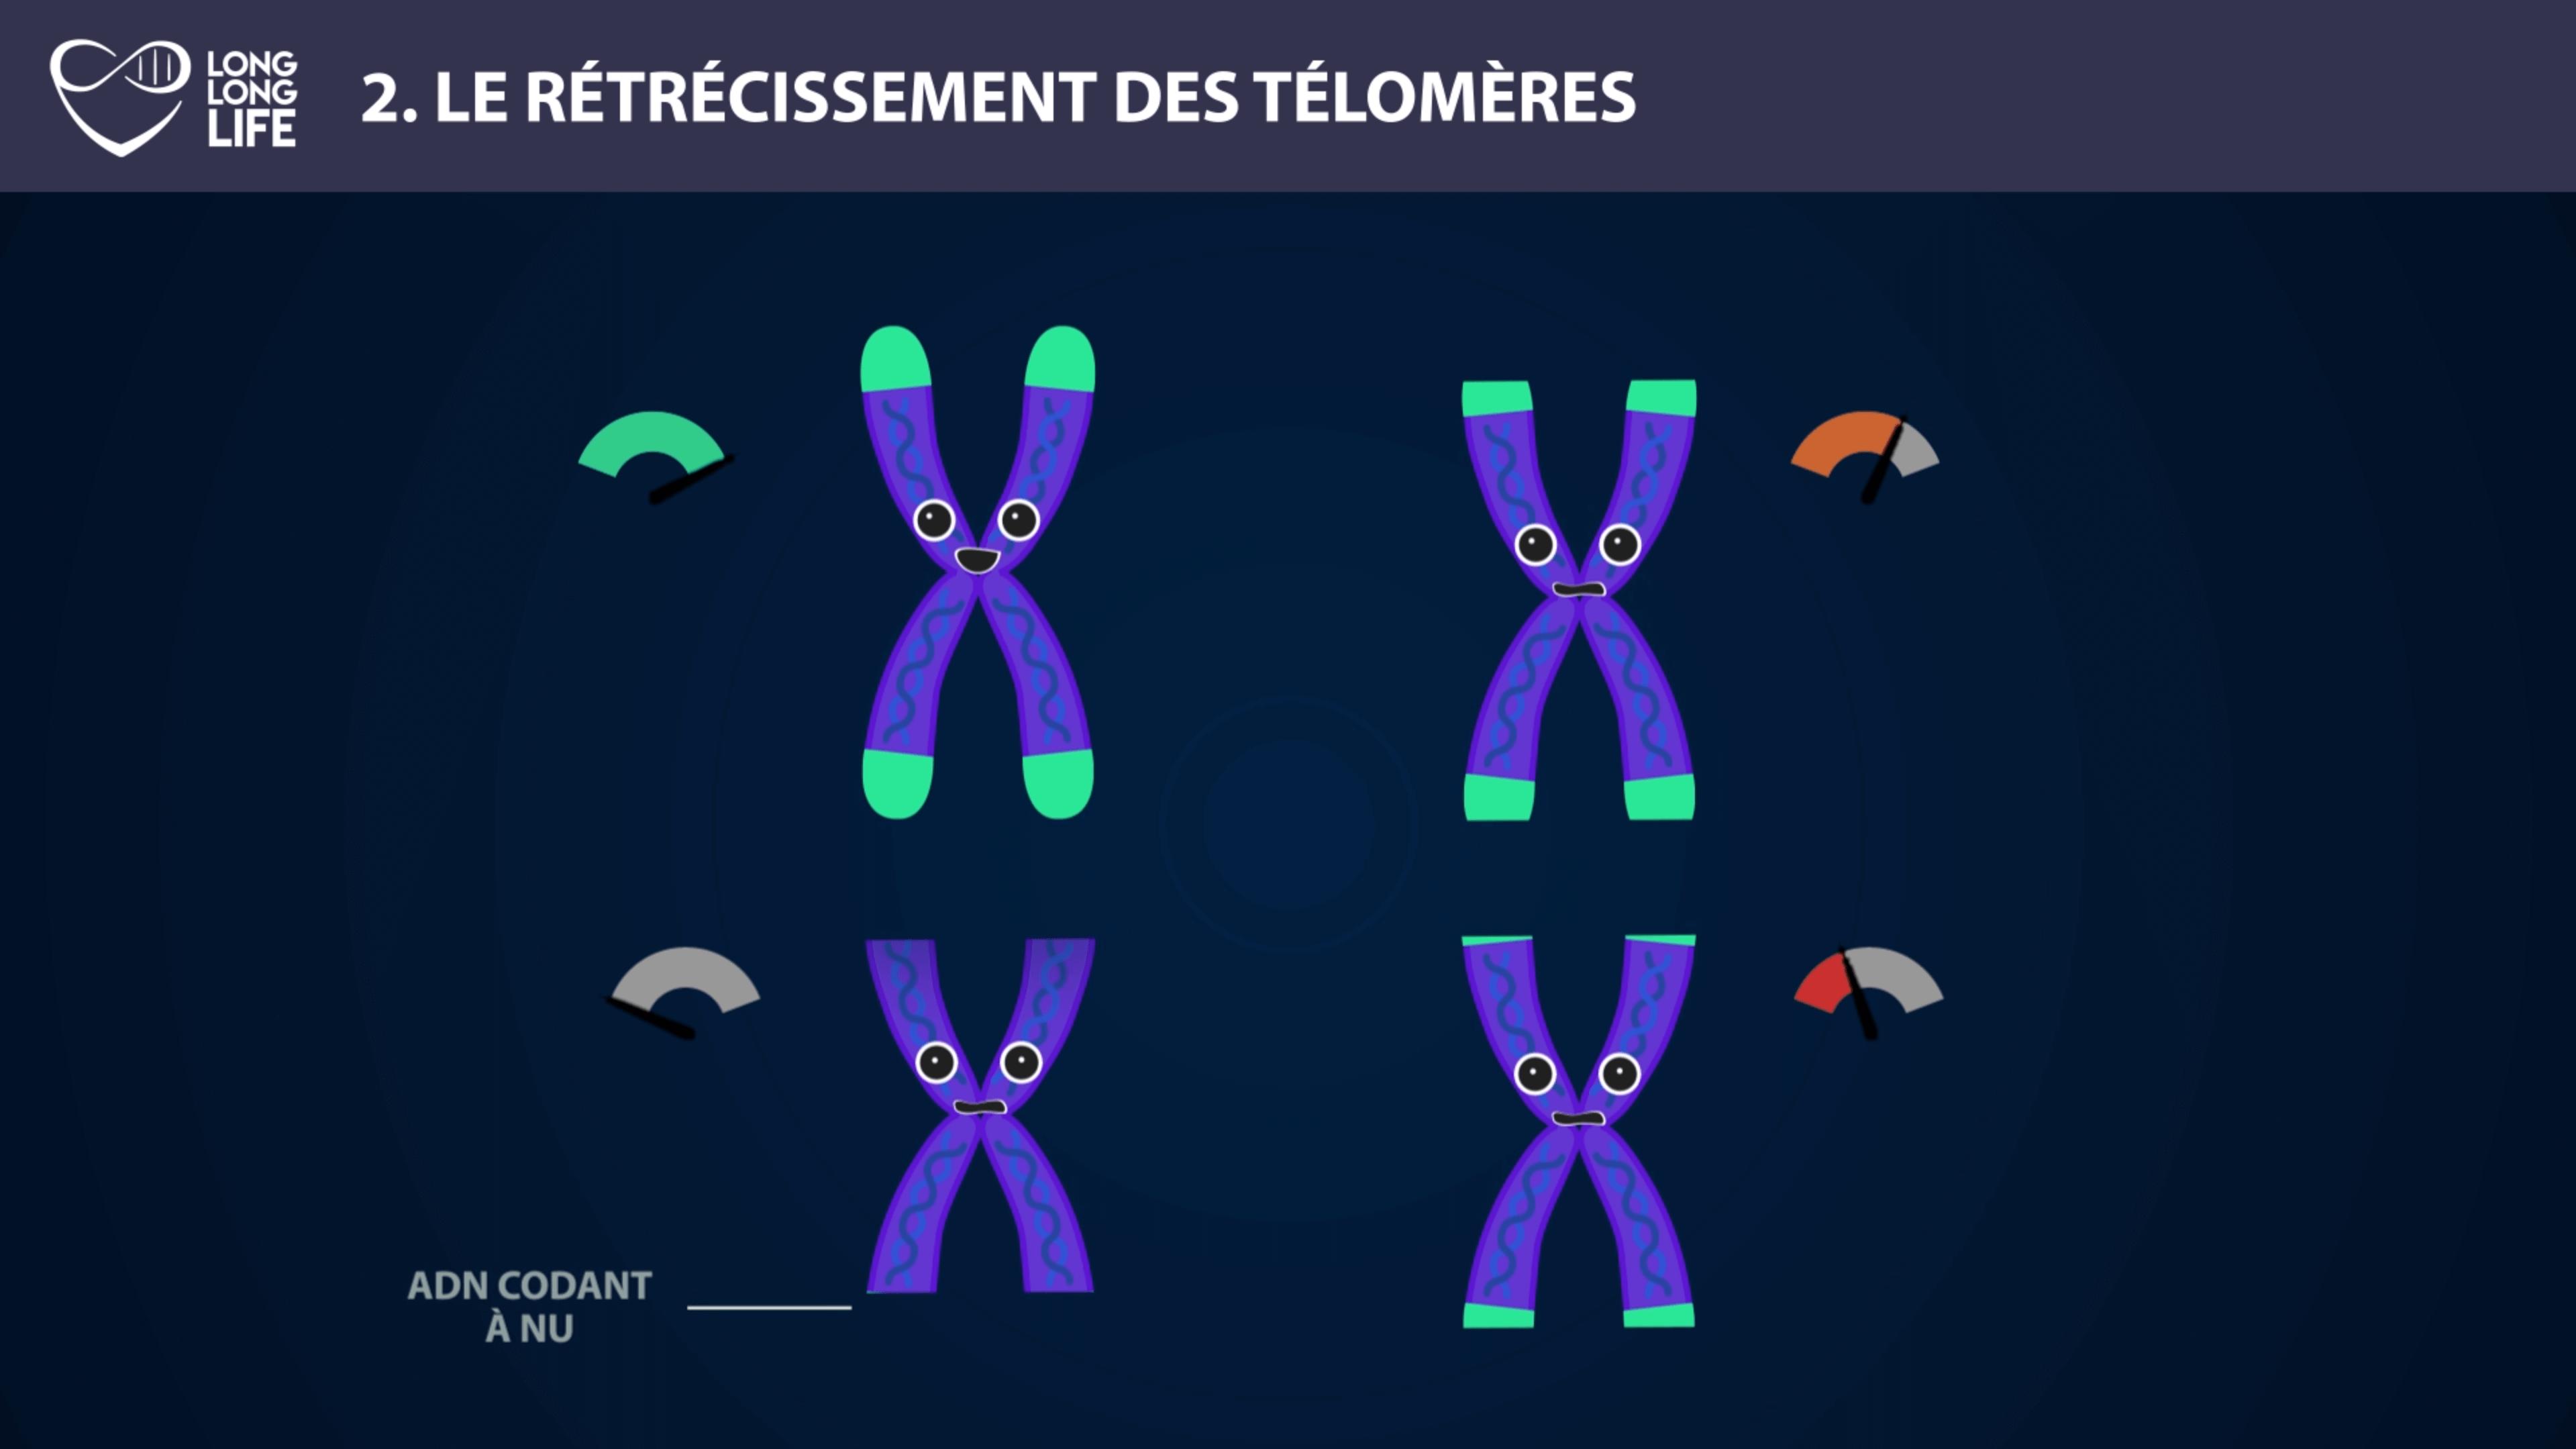 Télomère-Long-Long-Life-9-hallmarks of agign longevity transhumanism